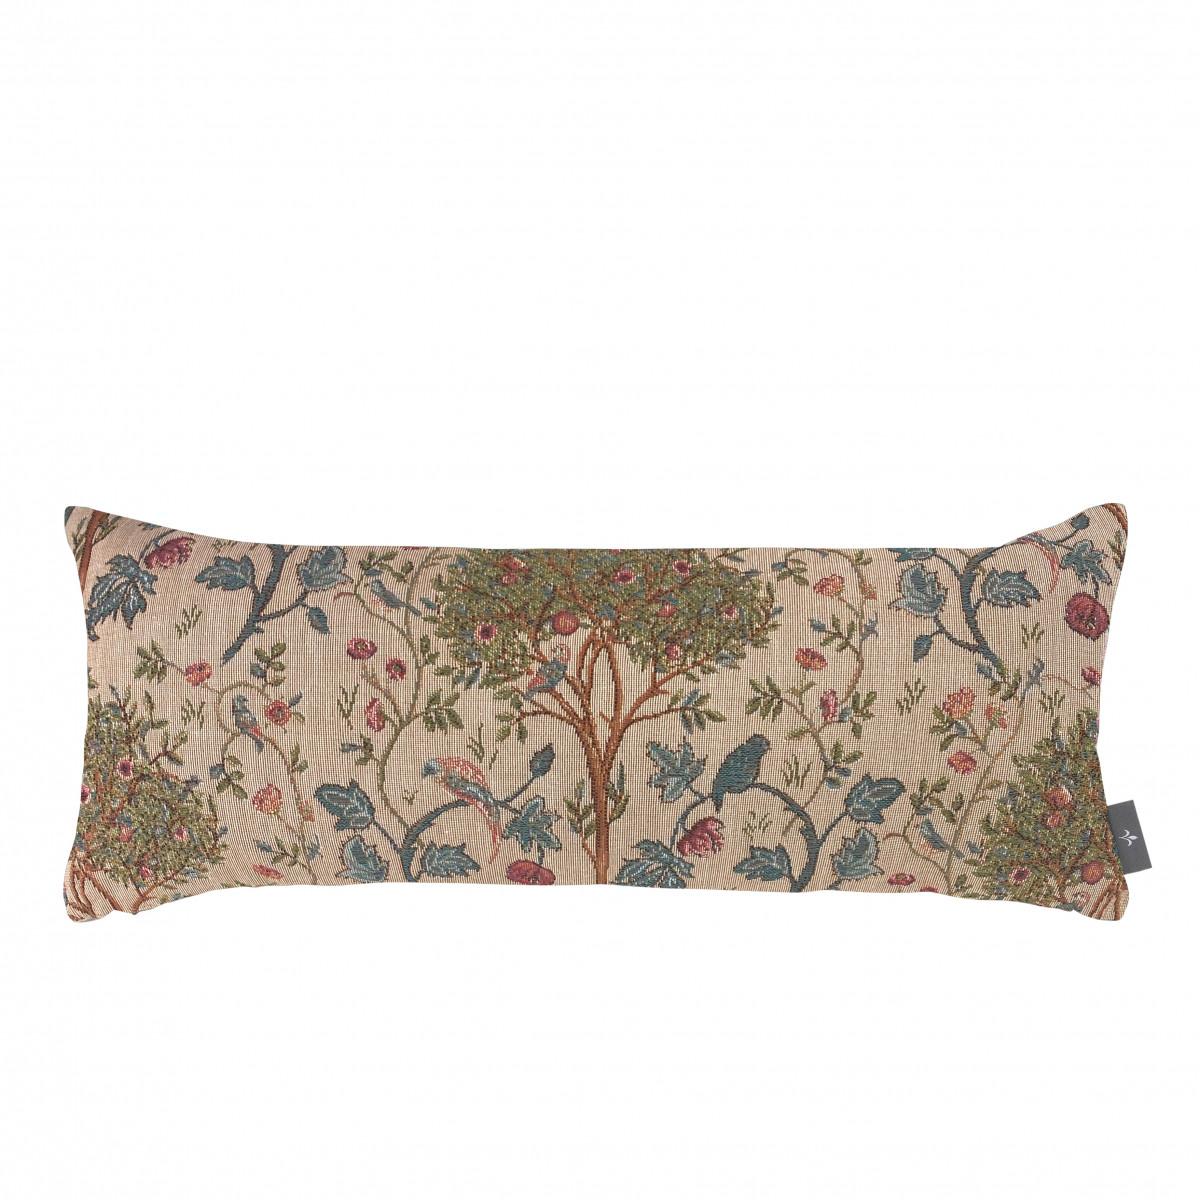 Coussin tapisserie kelmscott tree made in france beige 25x60